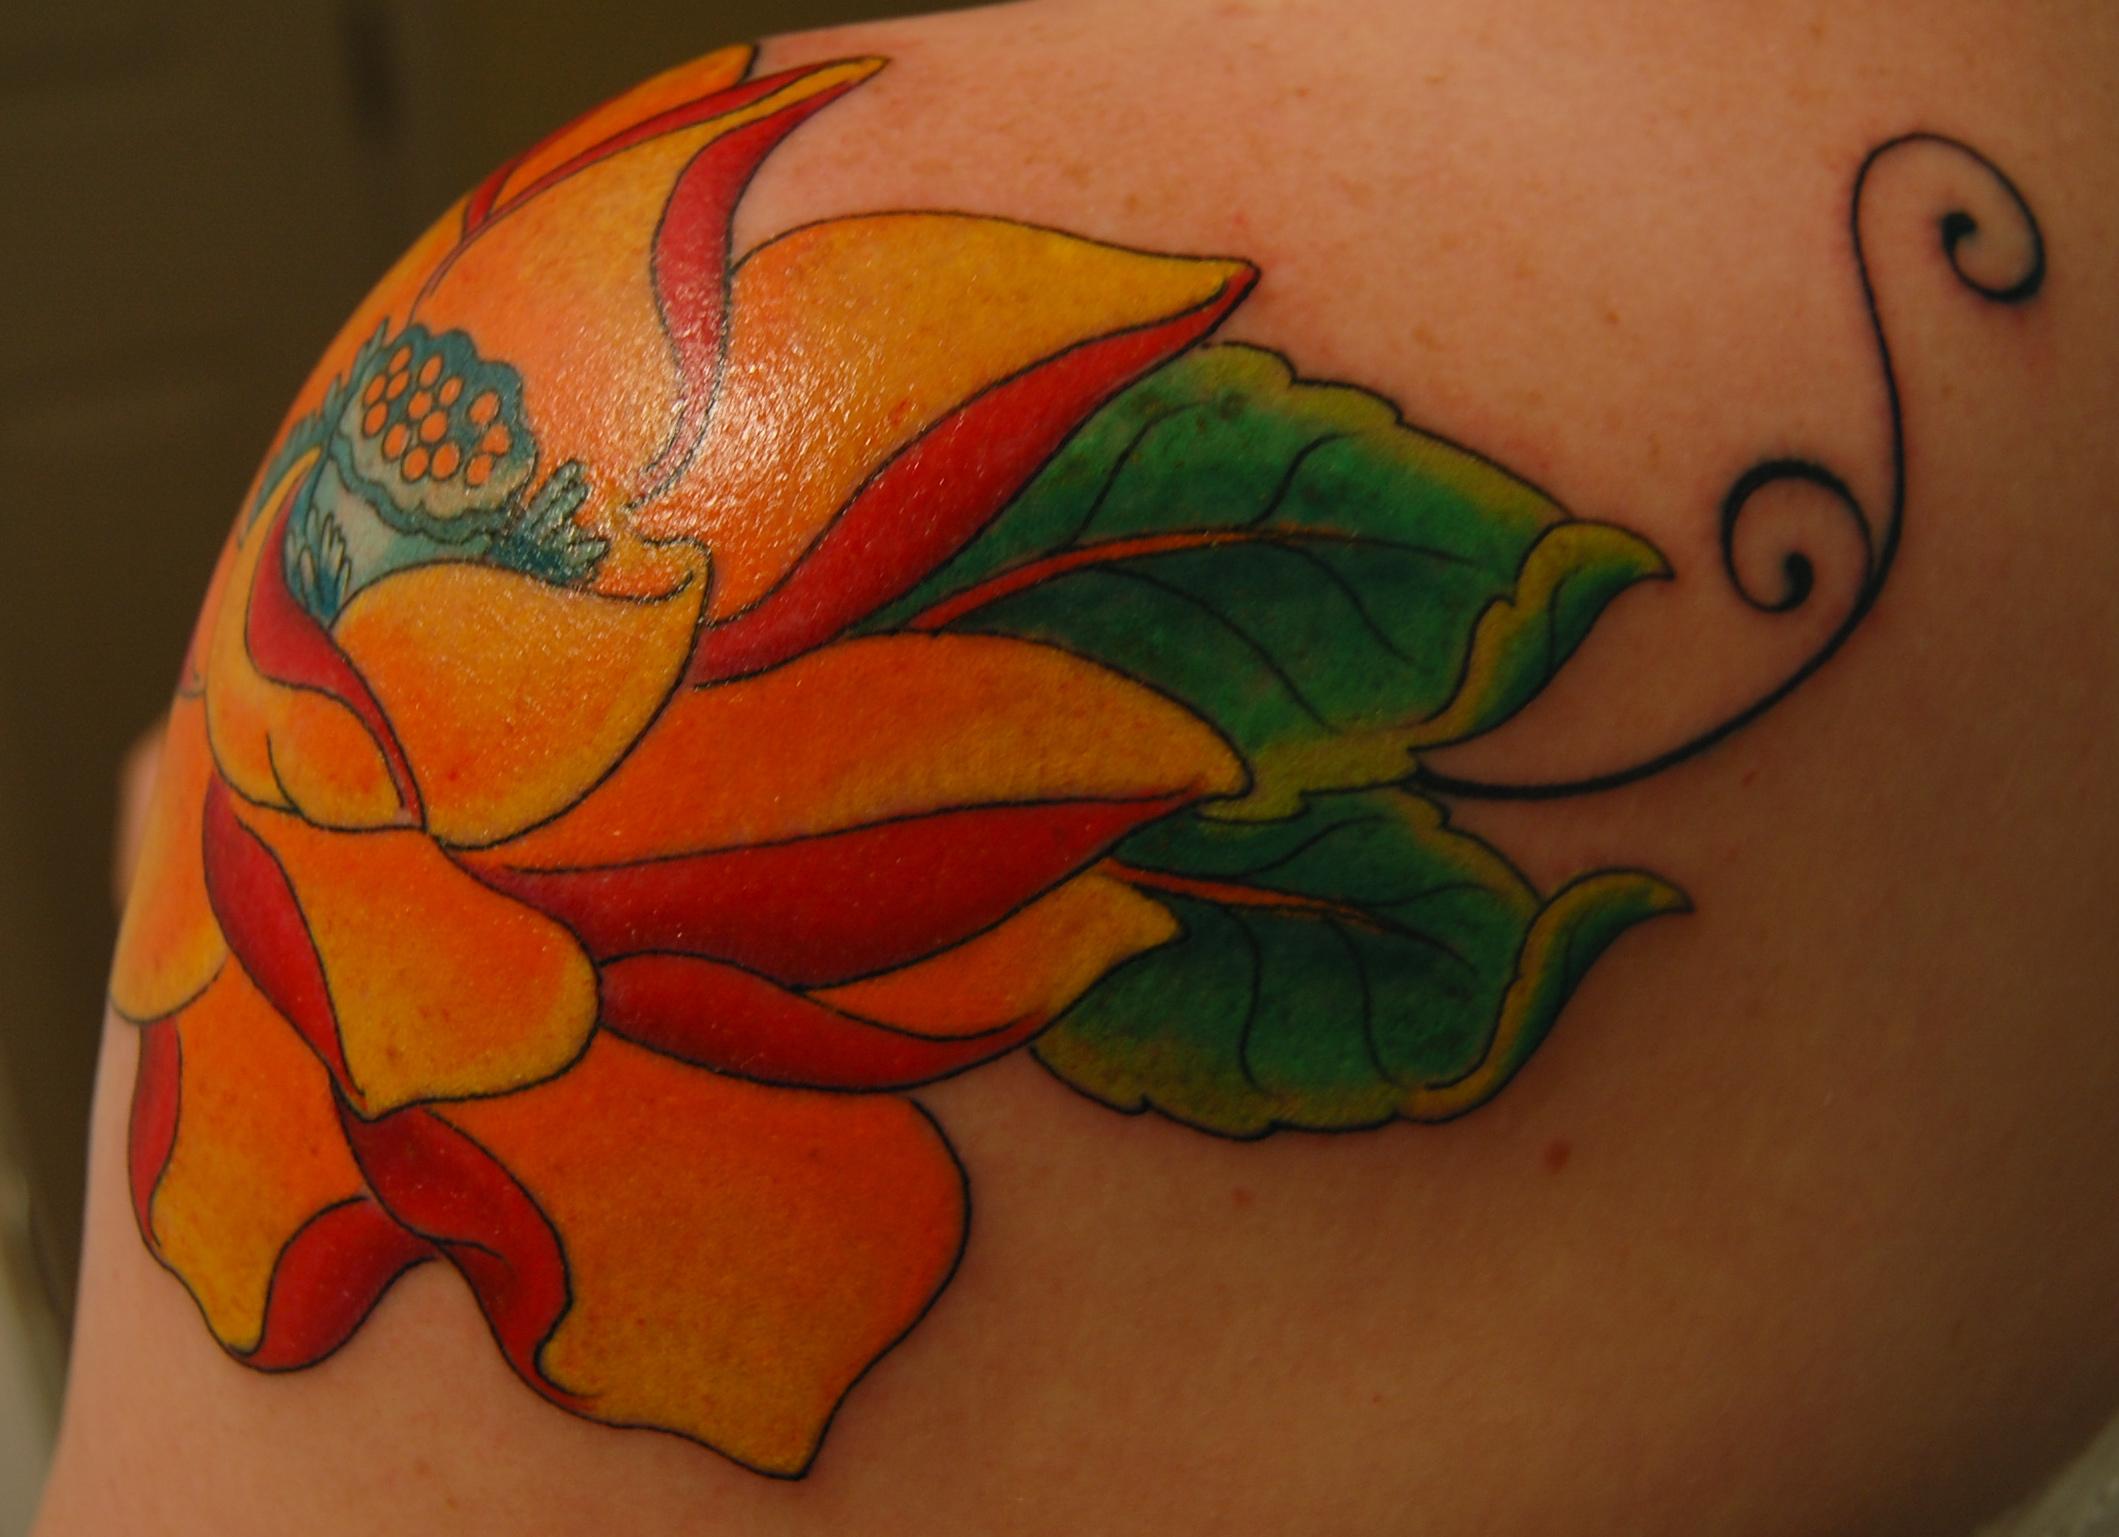 Miscarriage Memorial Tattoo Ideas